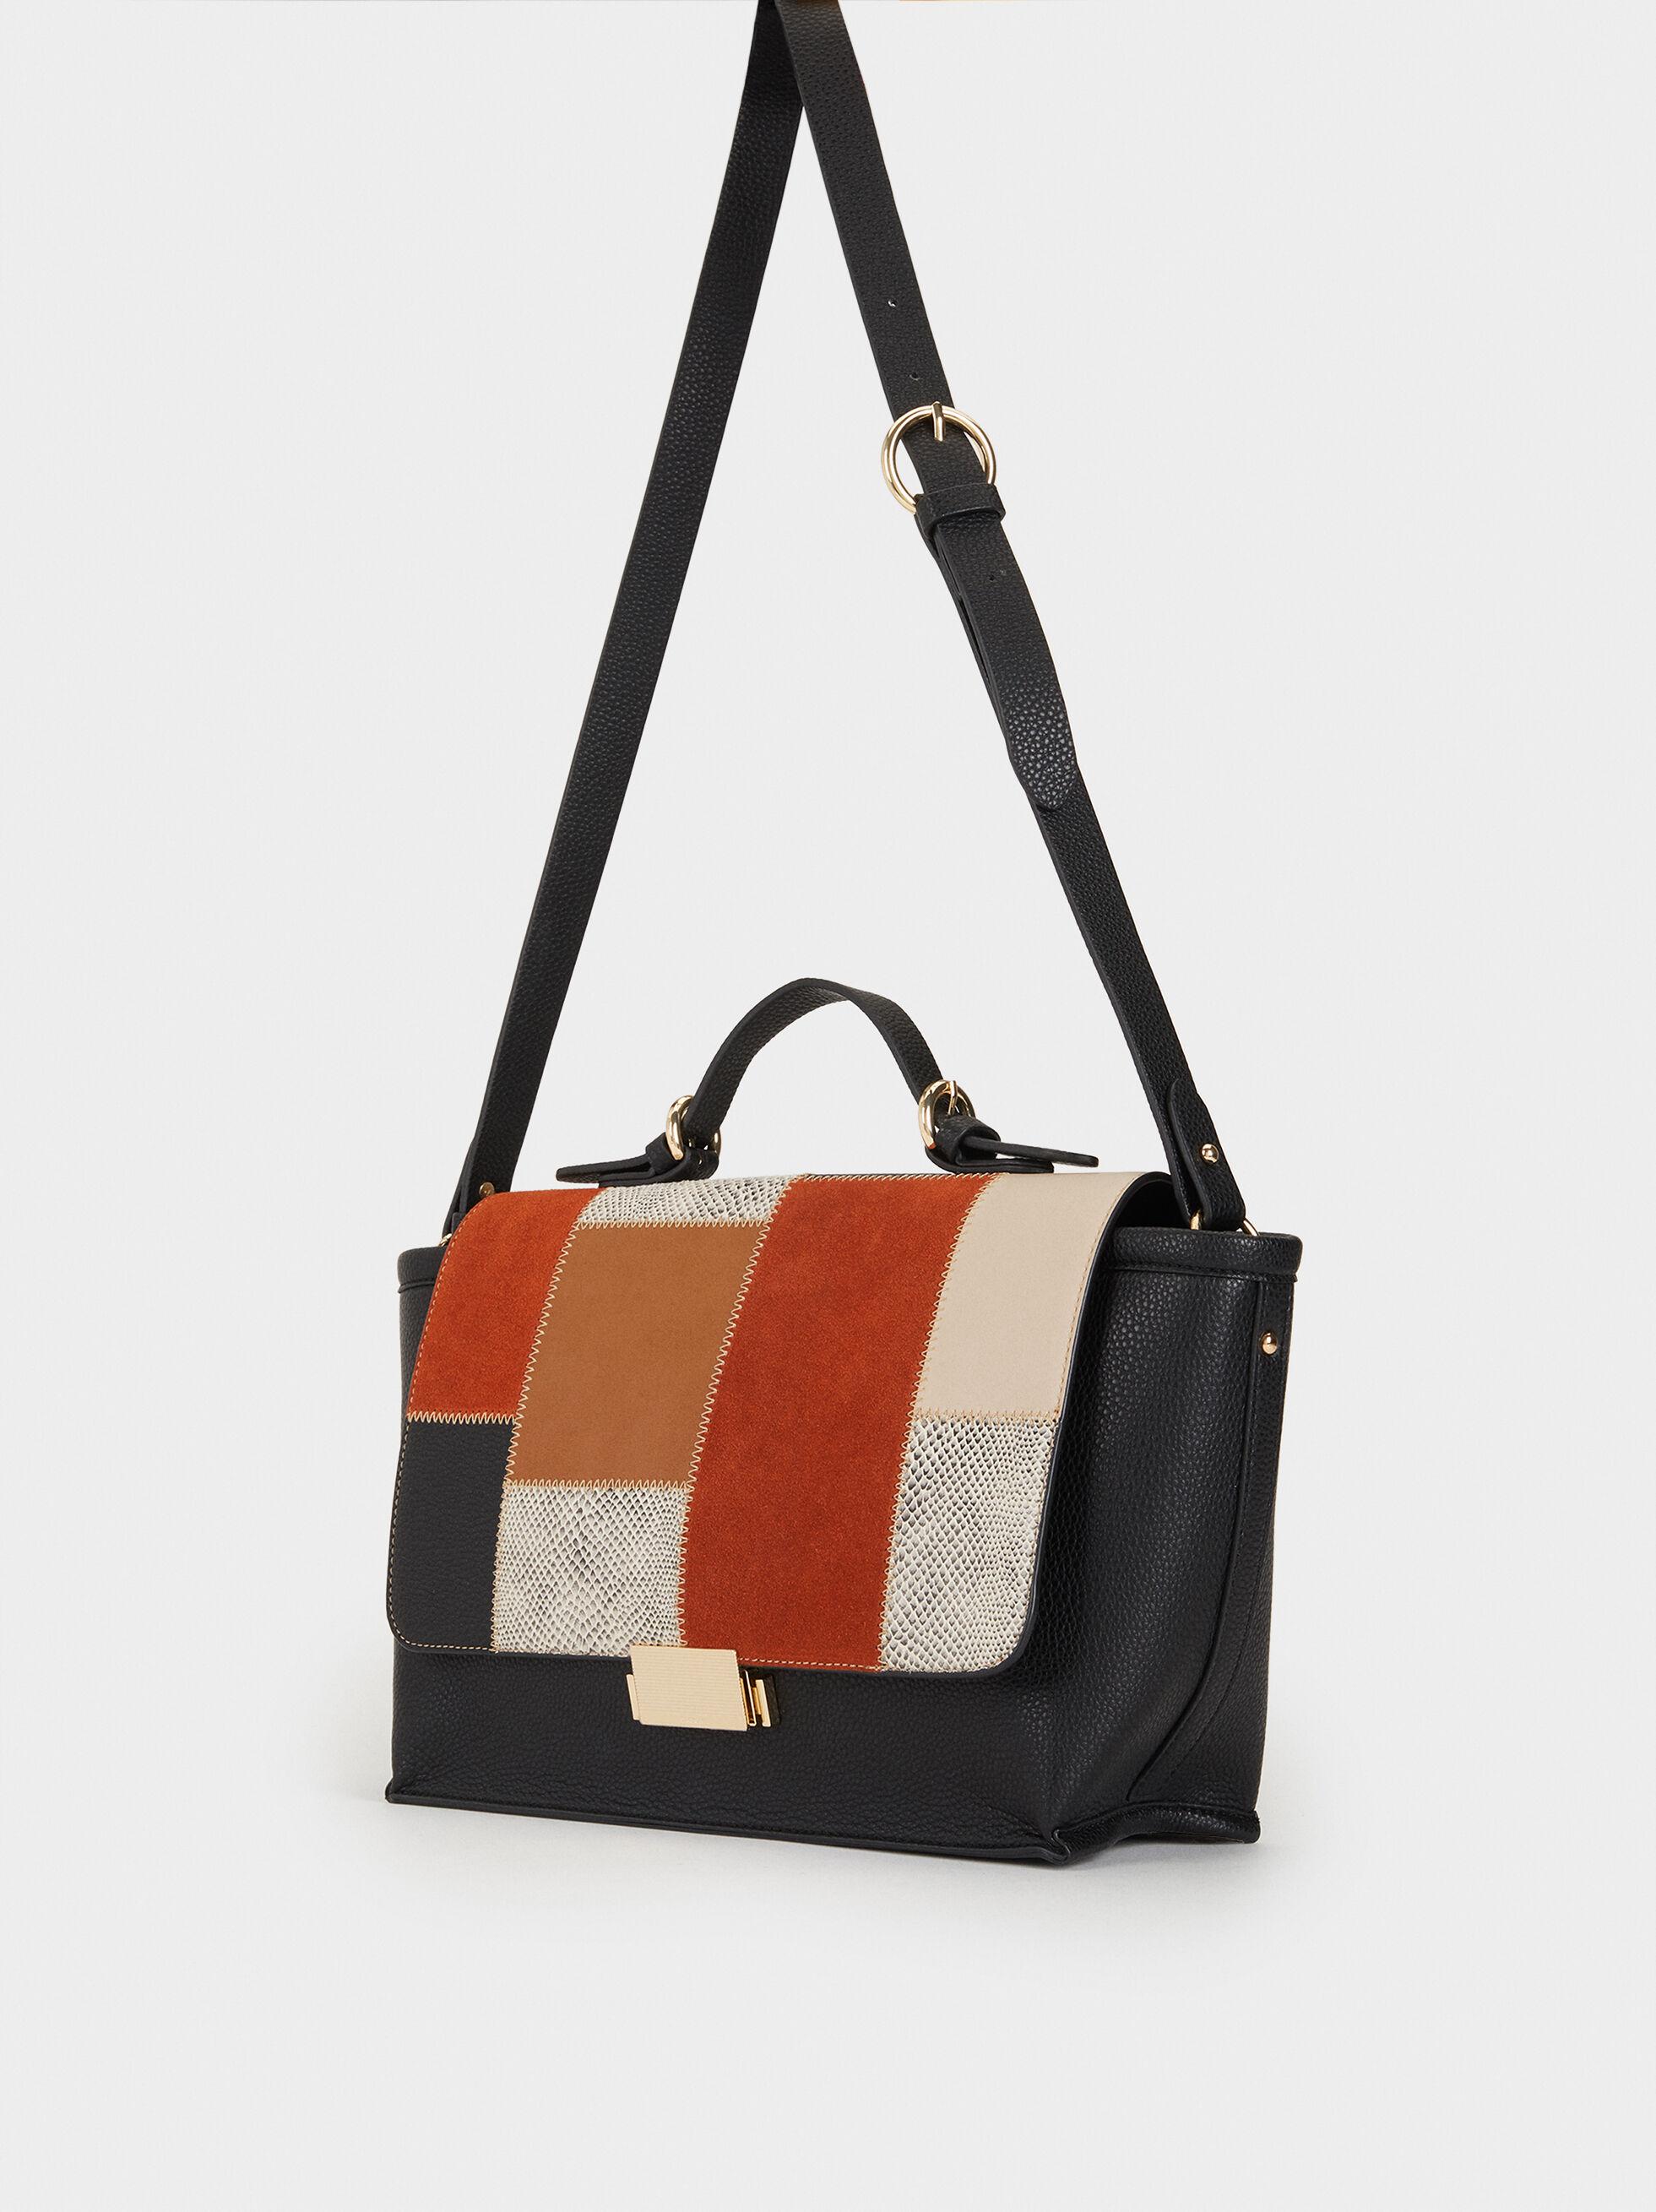 Large Bag With Patchwork Flap, Camel, hi-res